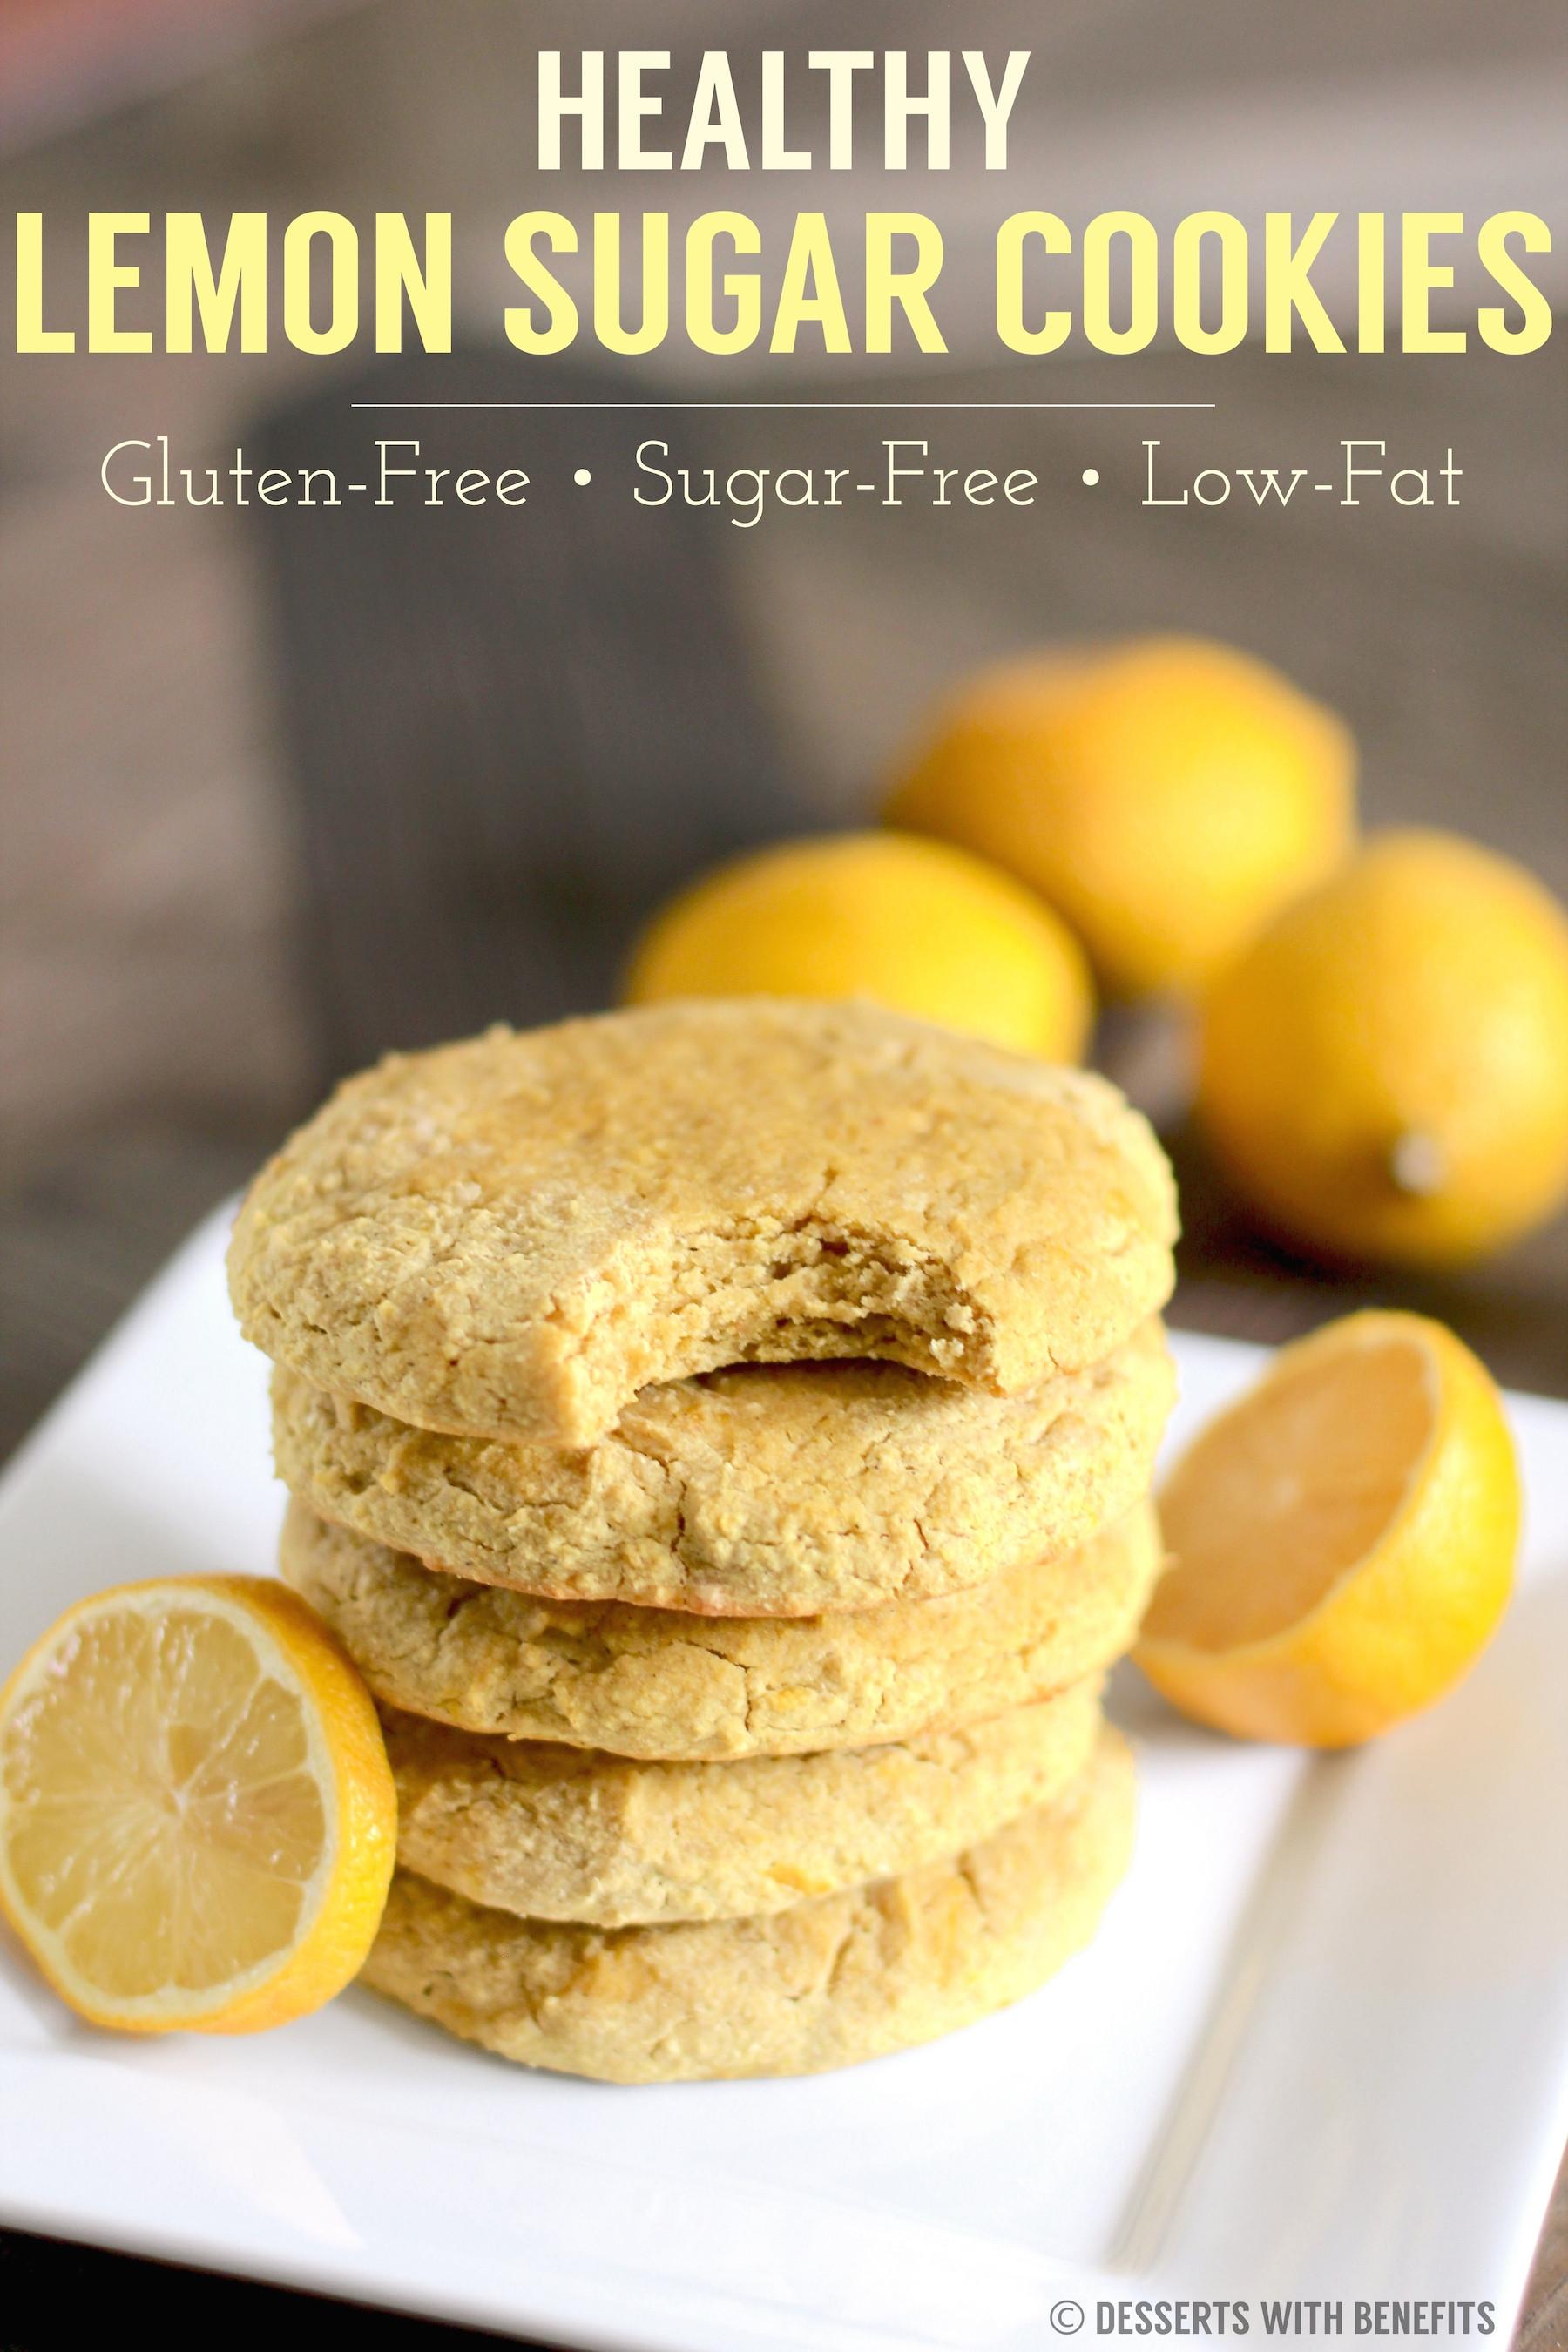 Gluten Free Dairy Free Sugar Free Dessert Recipes  Healthy Gluten Free Lemon Sugar Cookies Recipe